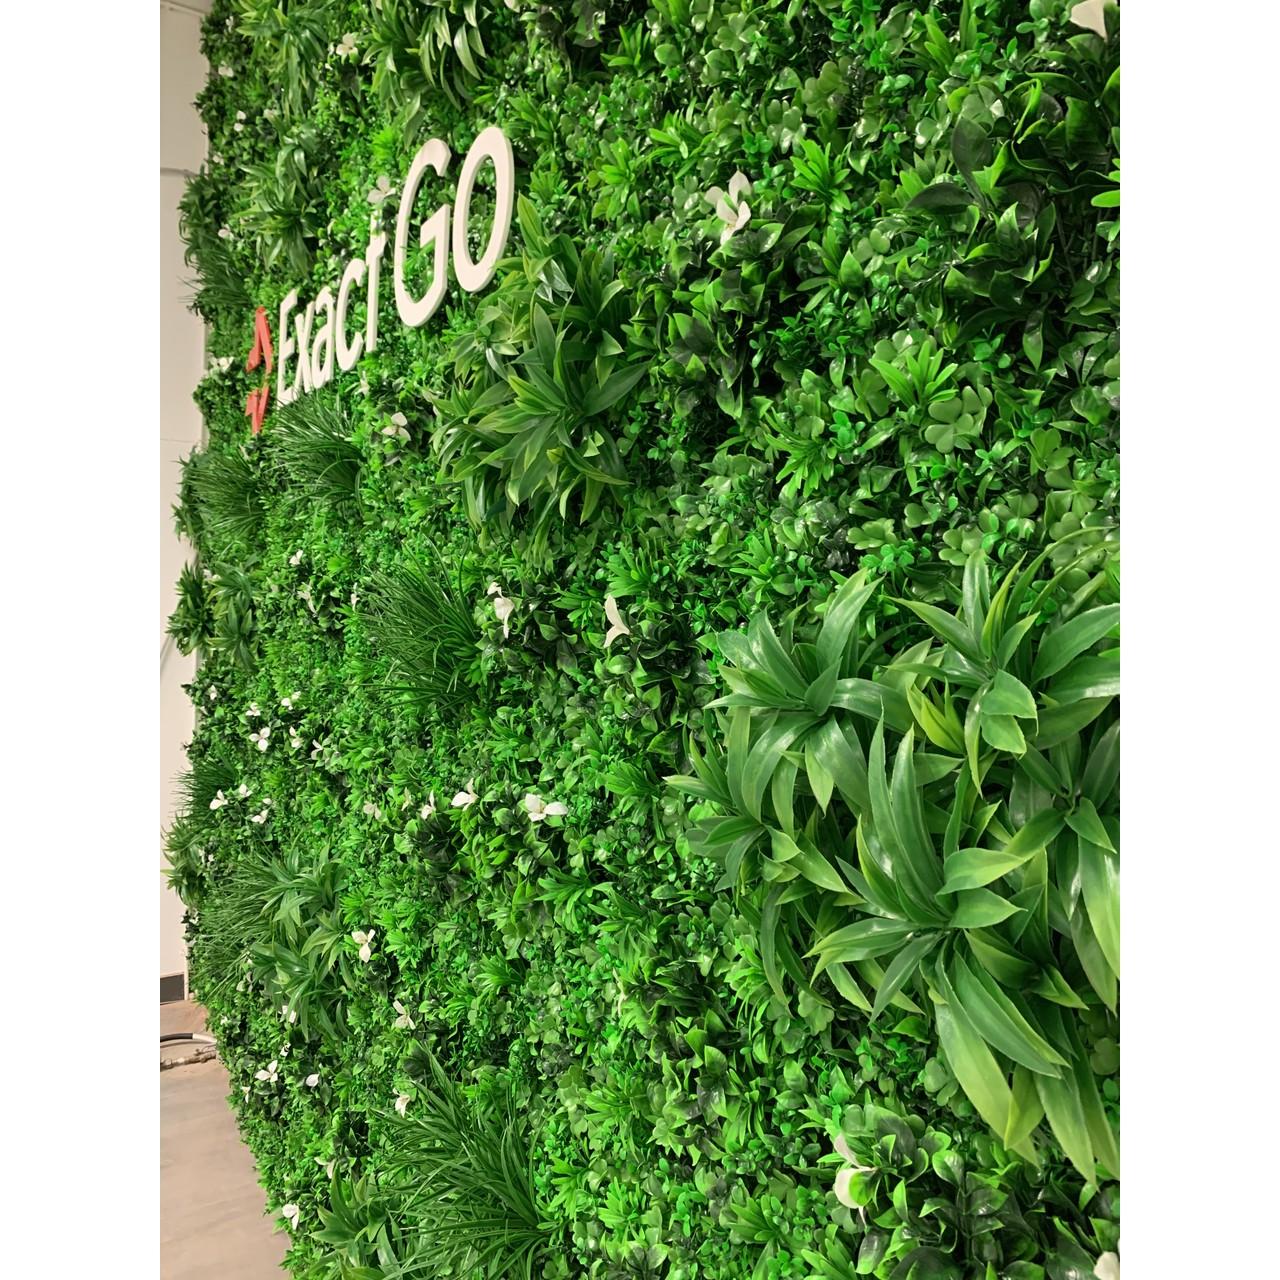 Kunst Groene Wand Basic - goedkope groene wand met logo